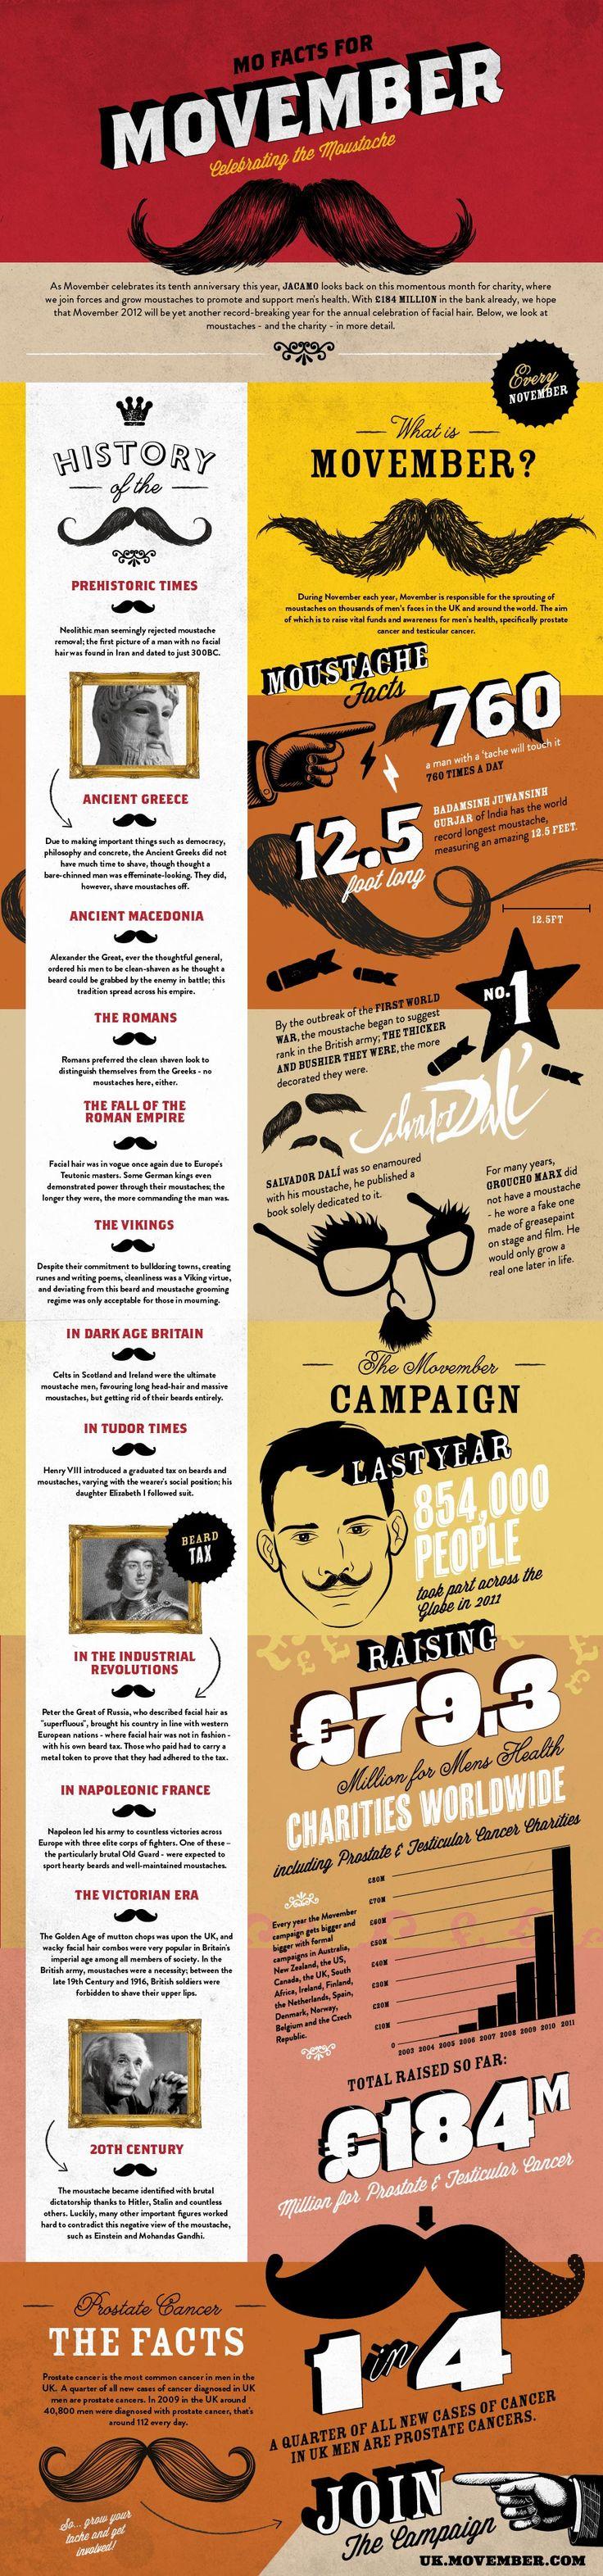 Mo Factas for Movember Infographic